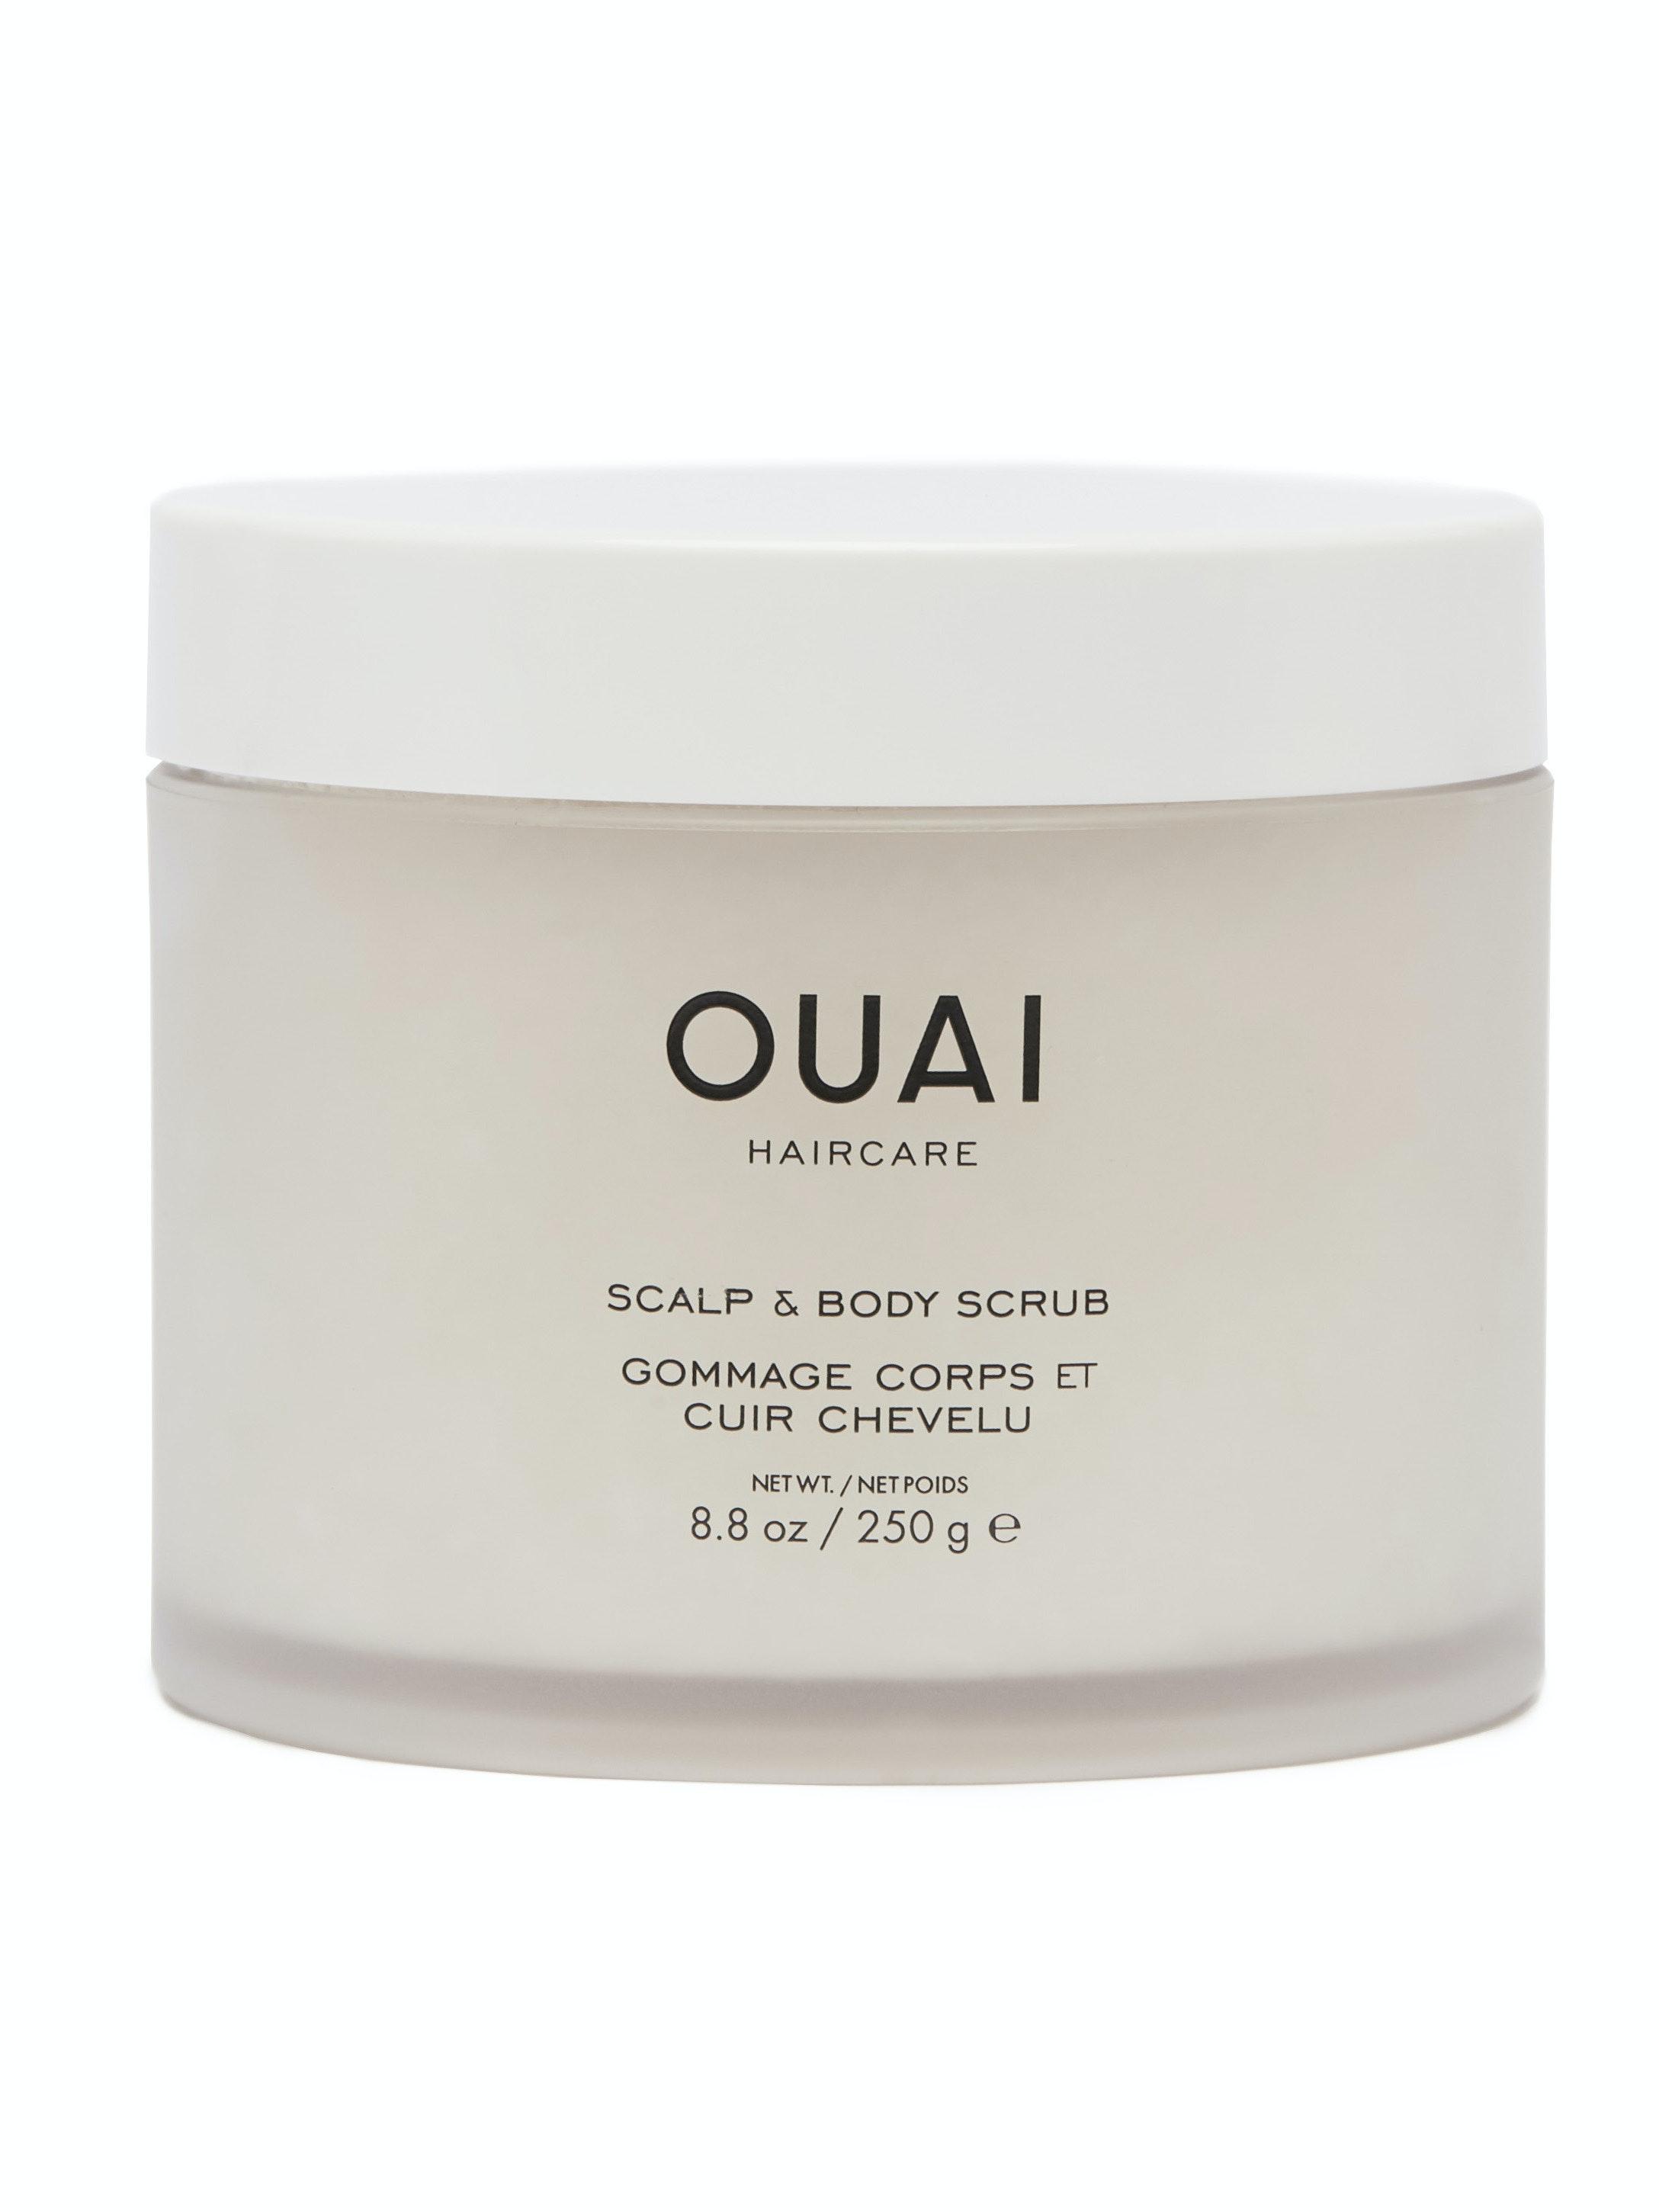 Ouai® Scalp and Body Scrub